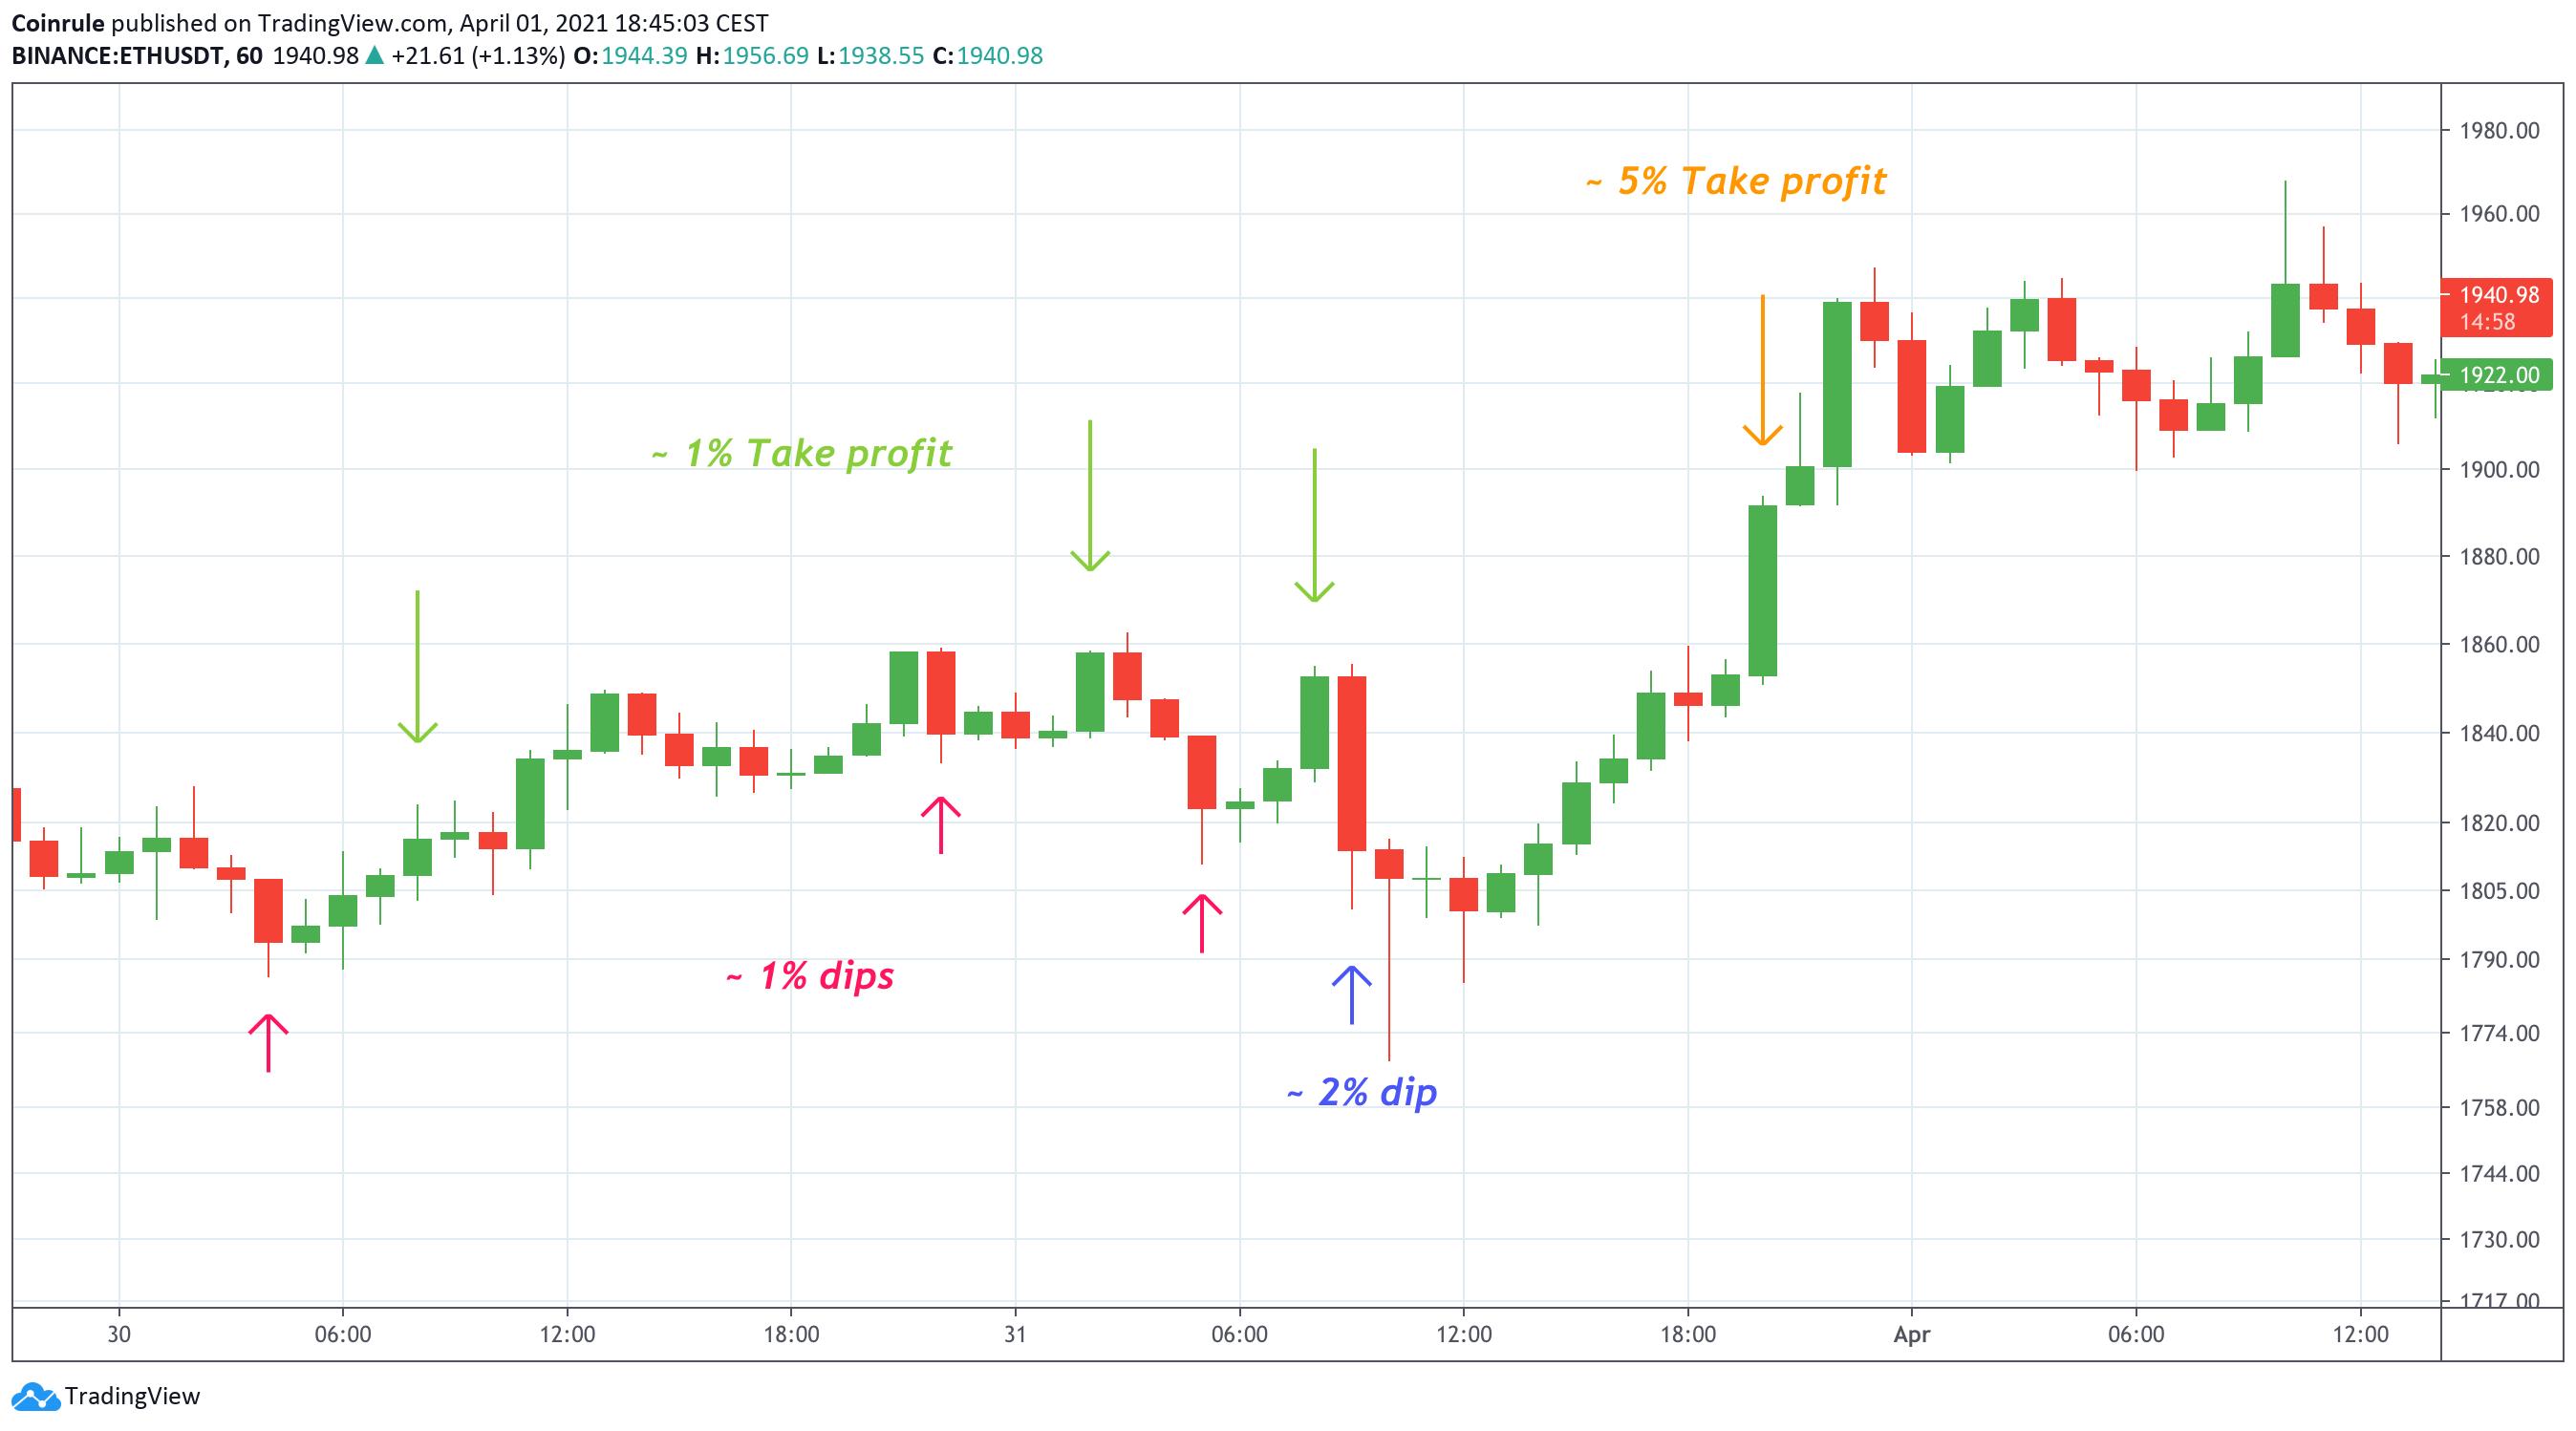 Price dips on the ETHUSDT chart